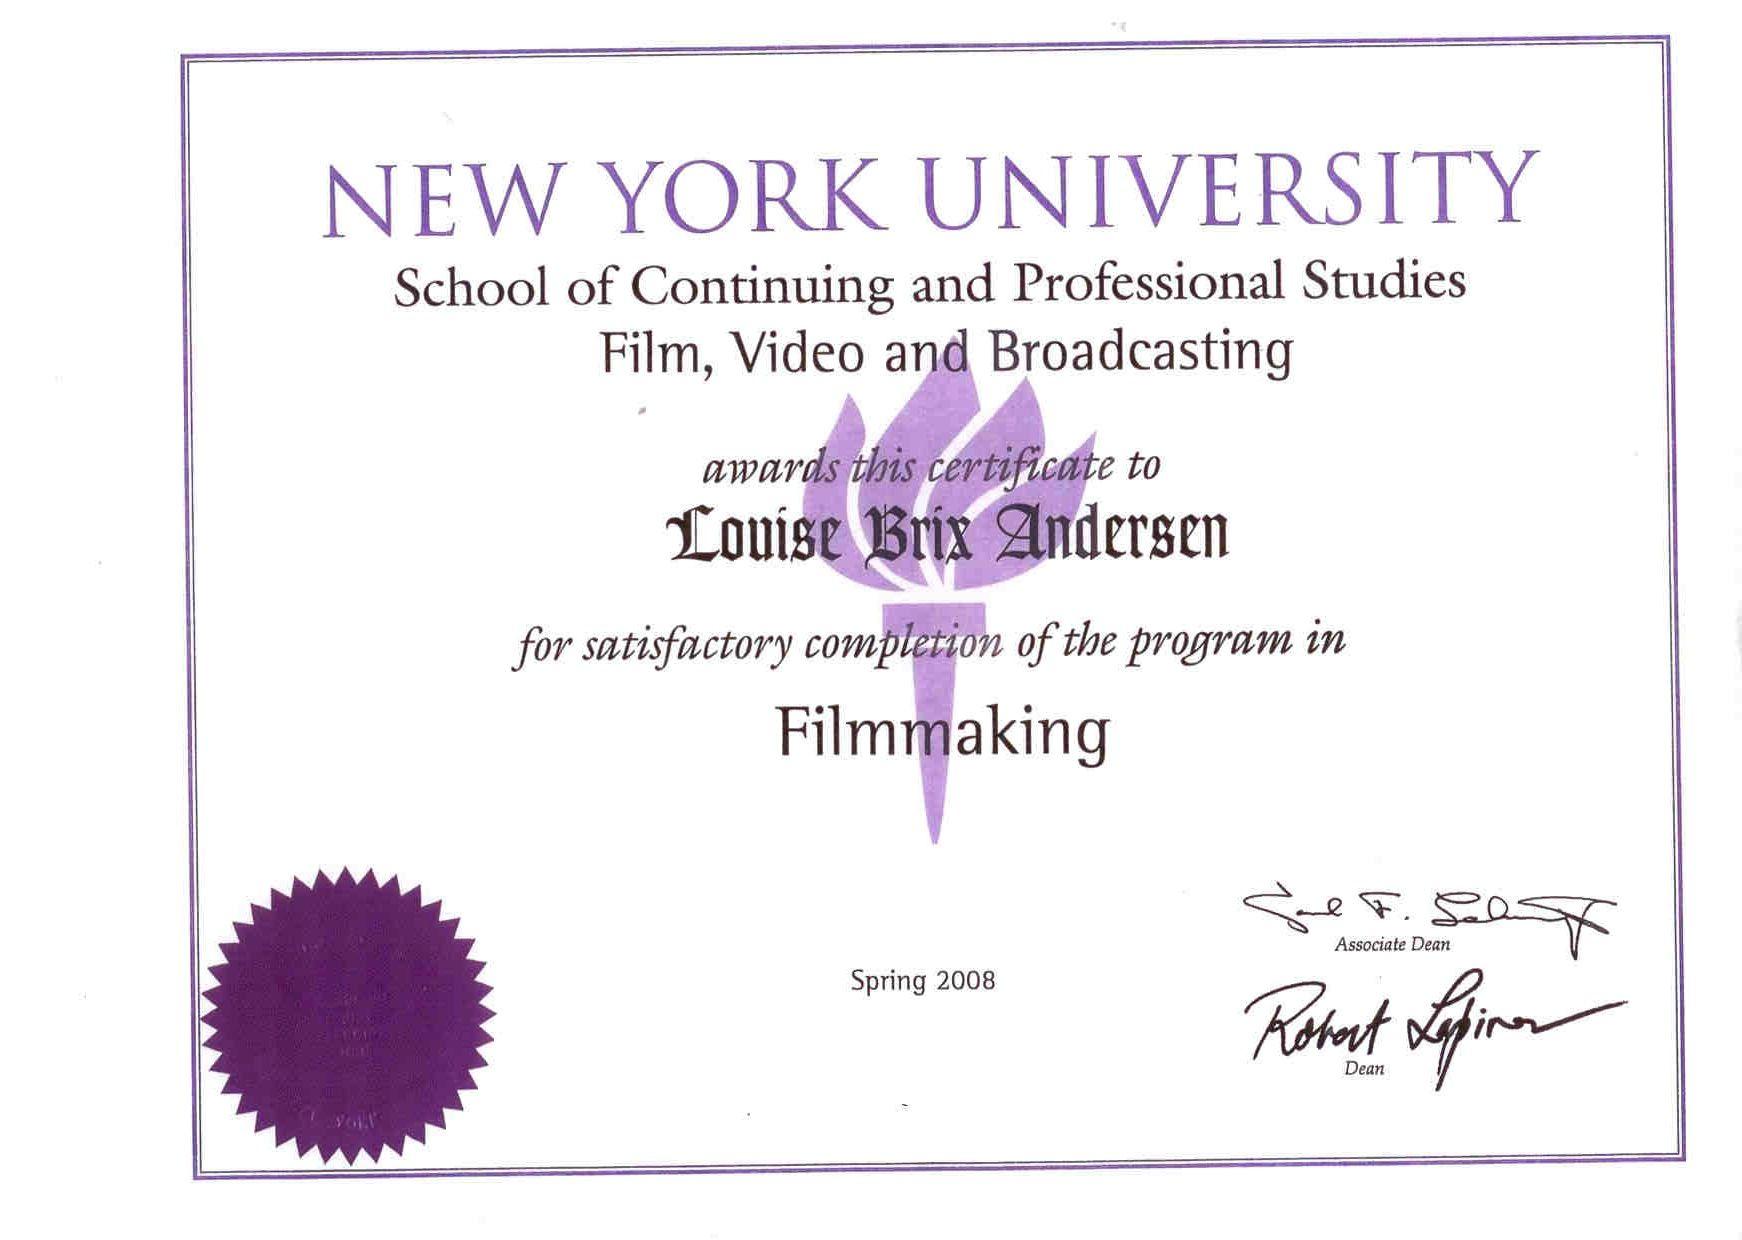 Certificate In Filmmaking At The Nyu School Of Continuing Professional Studies Filmmaking Study York University